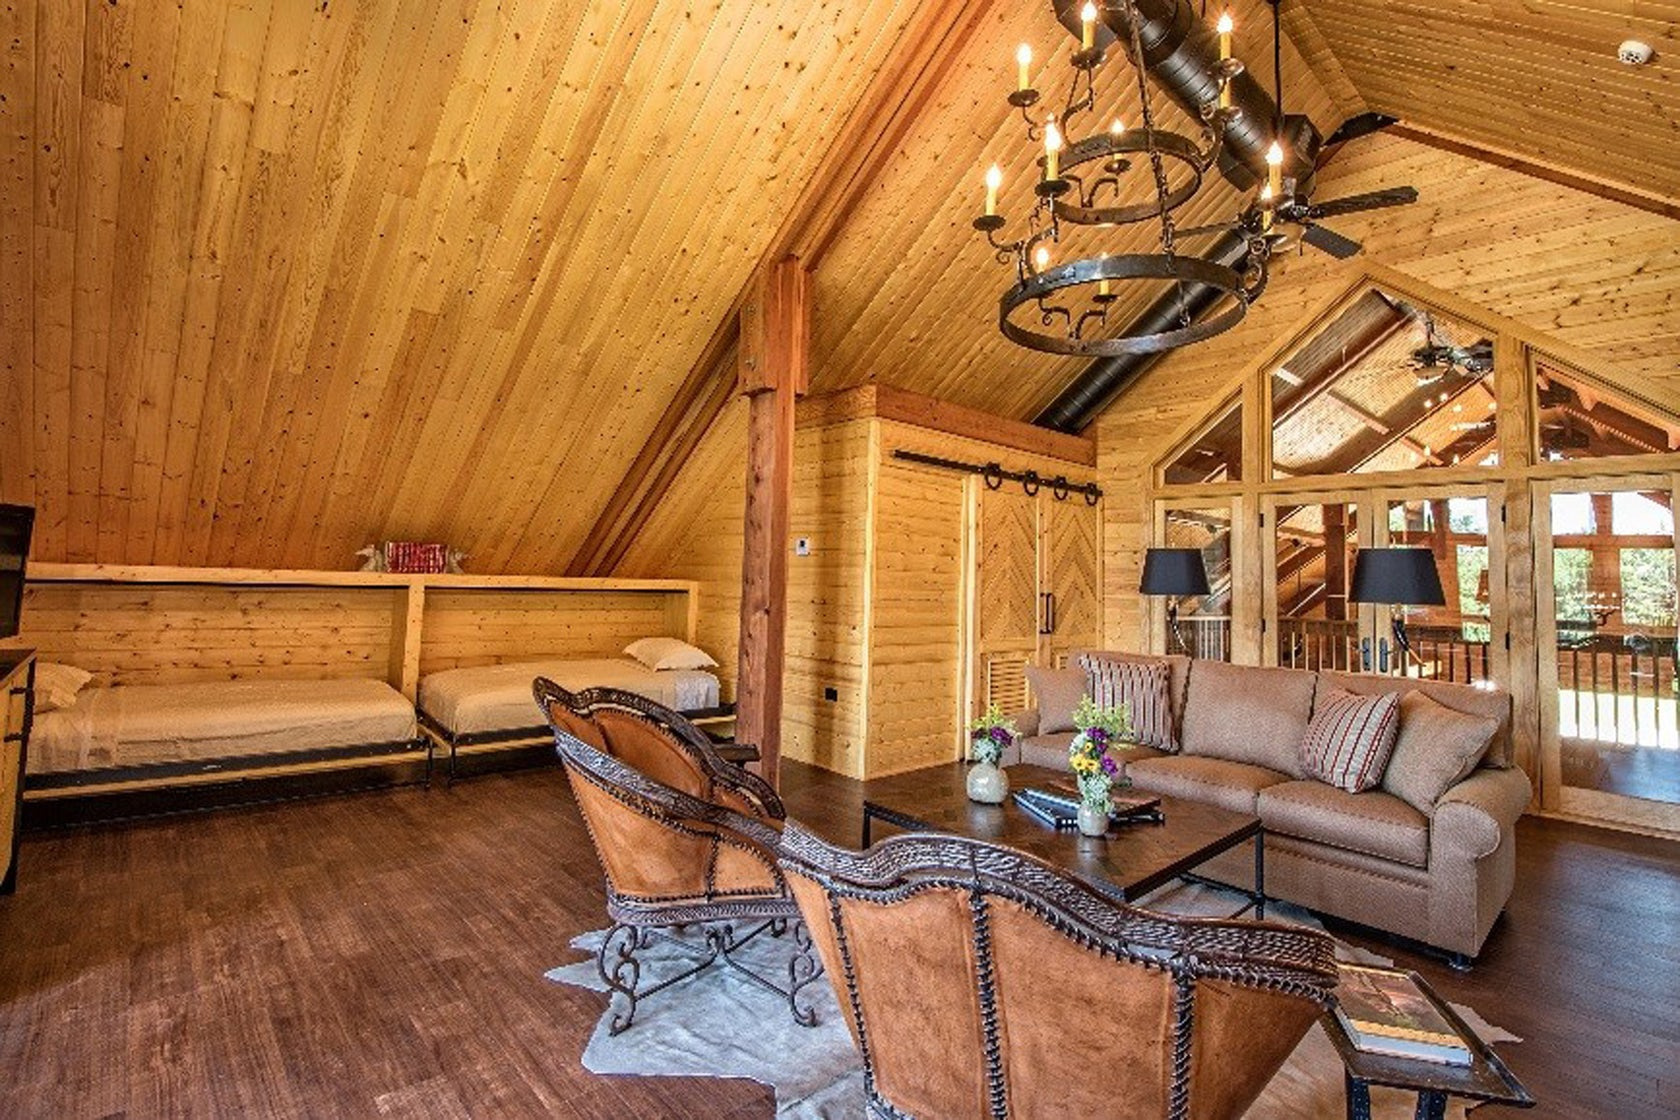 Ami austin interior design architizer - Interior design firms austin tx ...